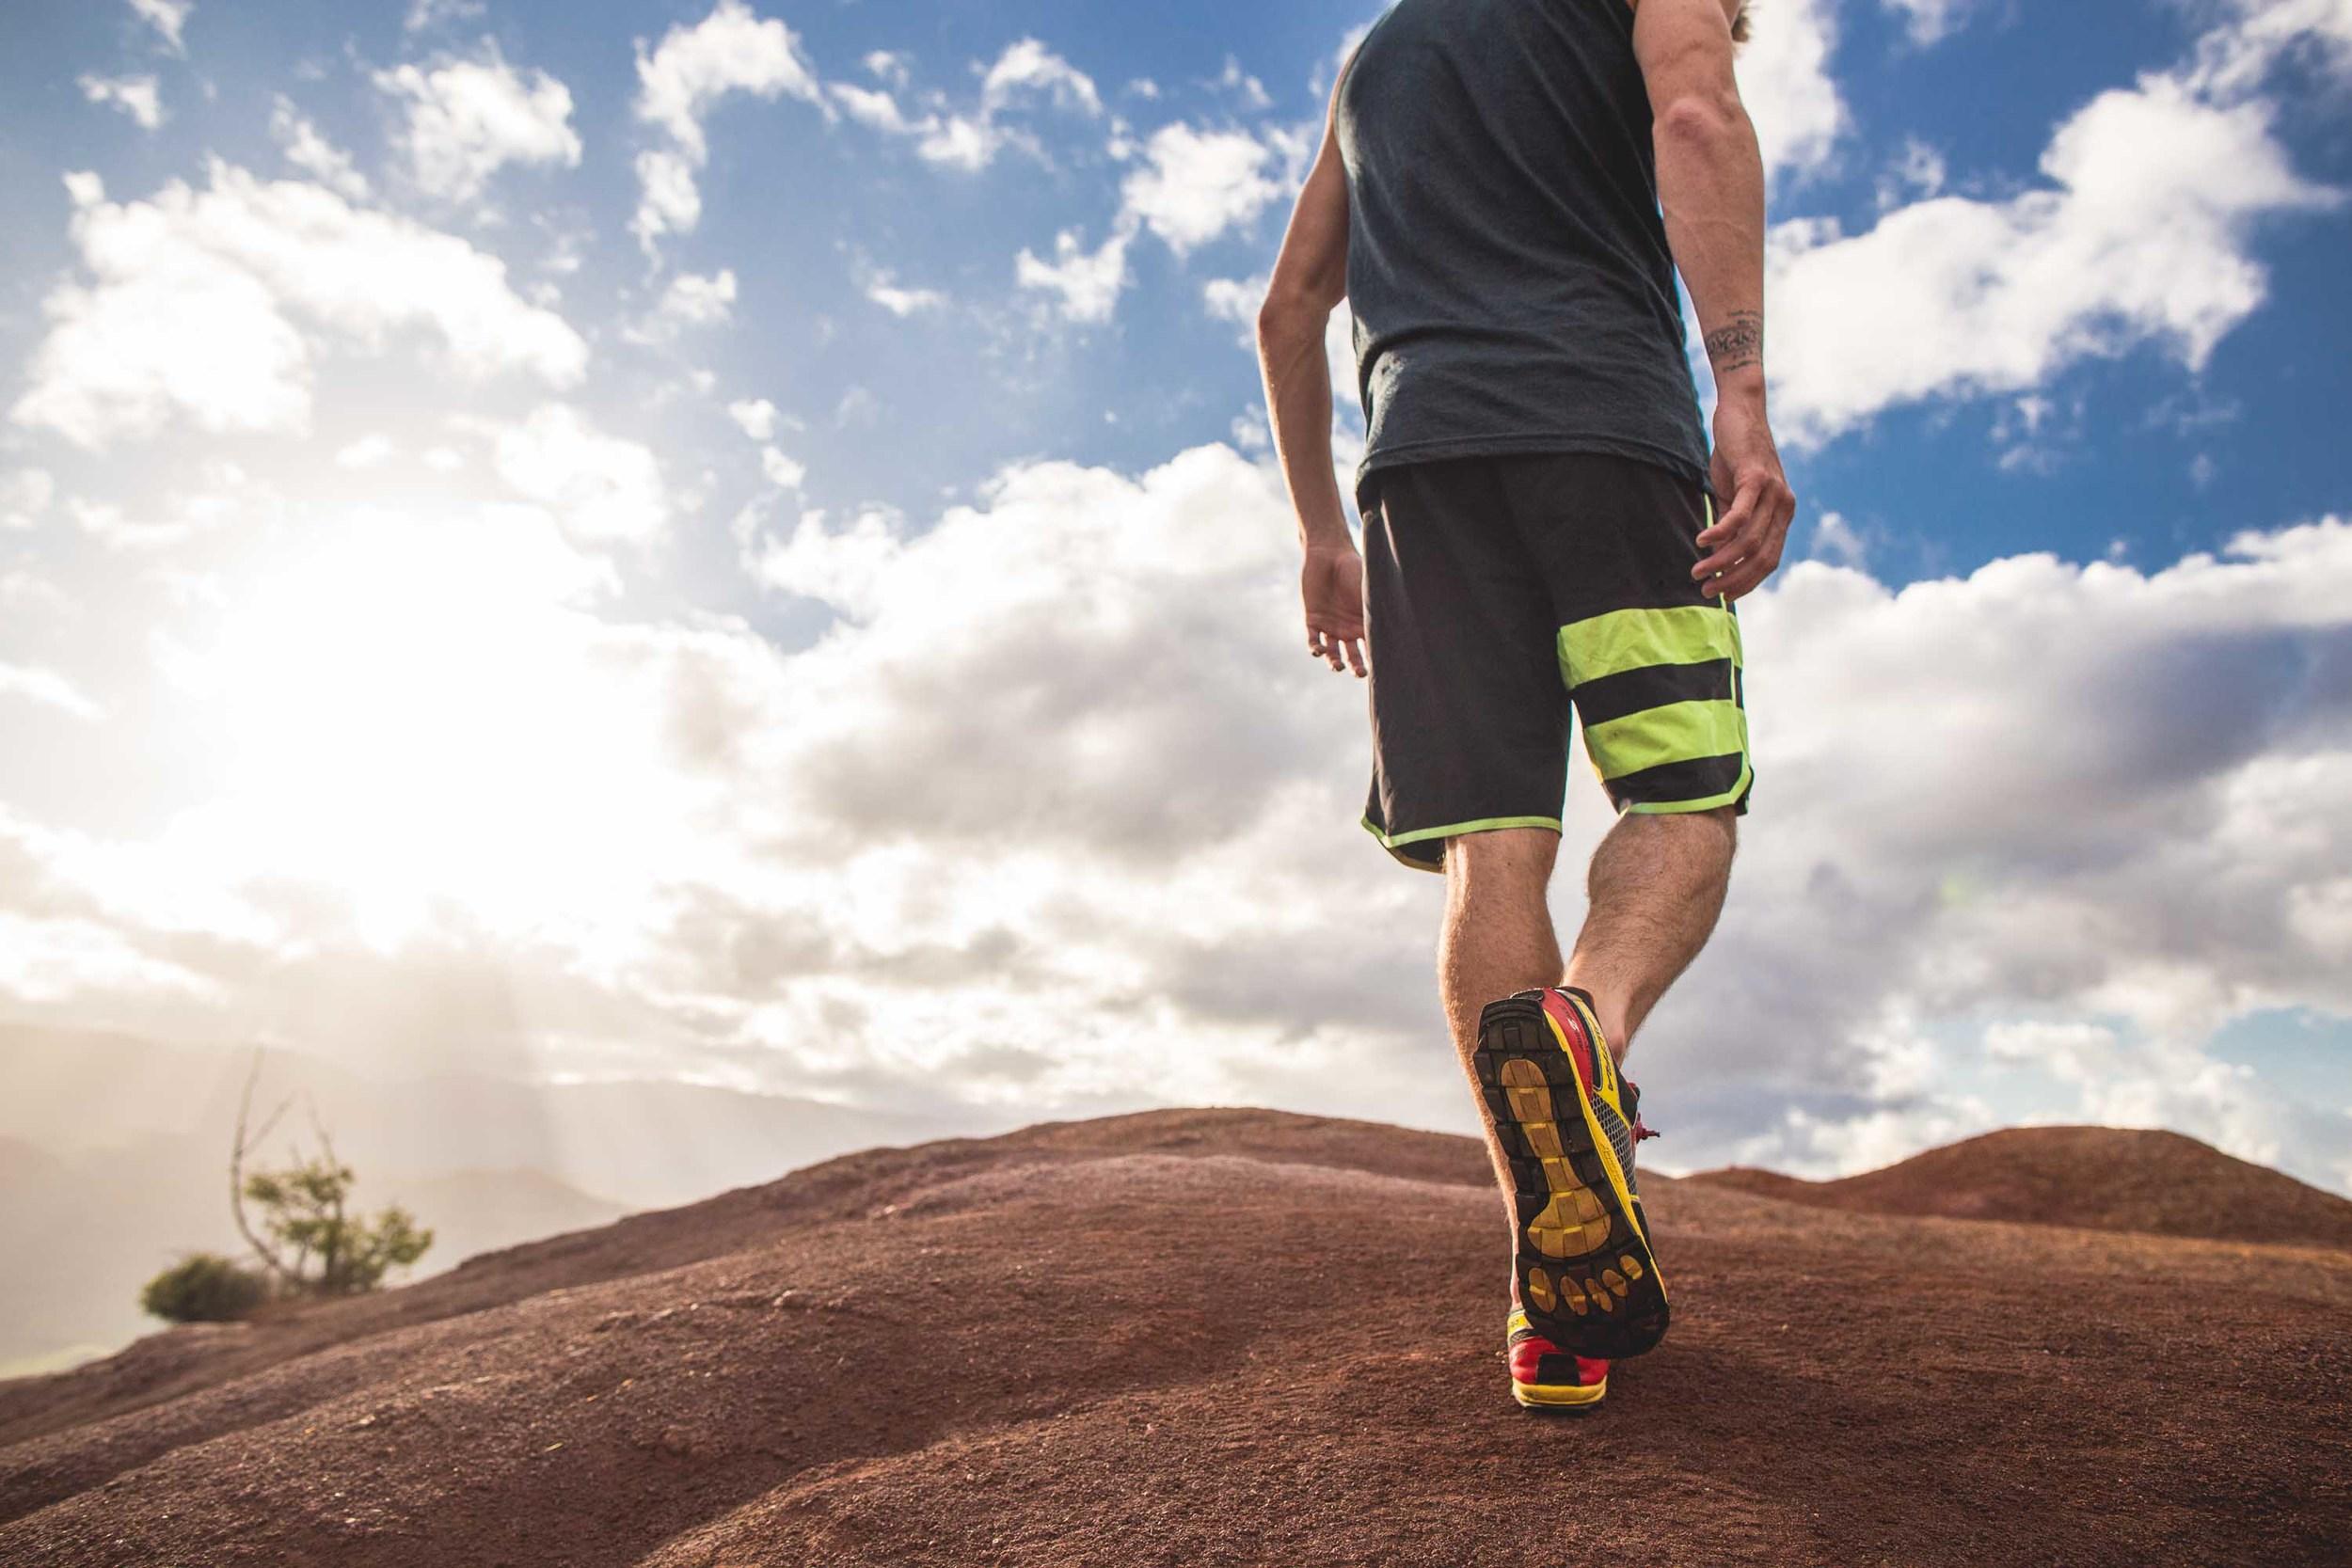 bryce-johnson-Moving Man-running-trails-hawaii-glee-actor-jake pembrook.jpg